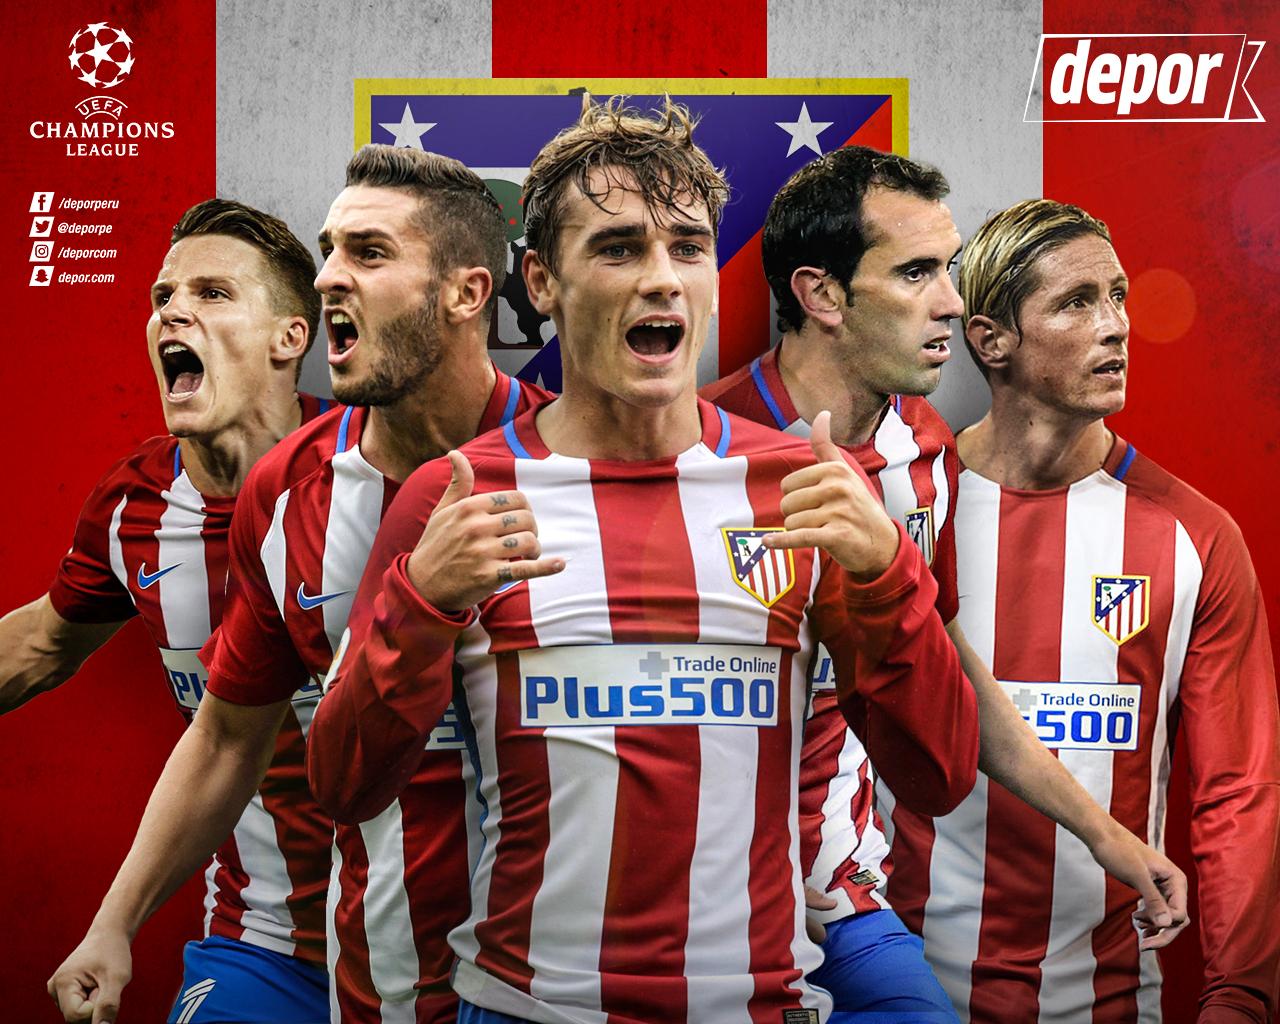 Champions descarga hoy totalmente gratis el Wallpaper de 1280x1024